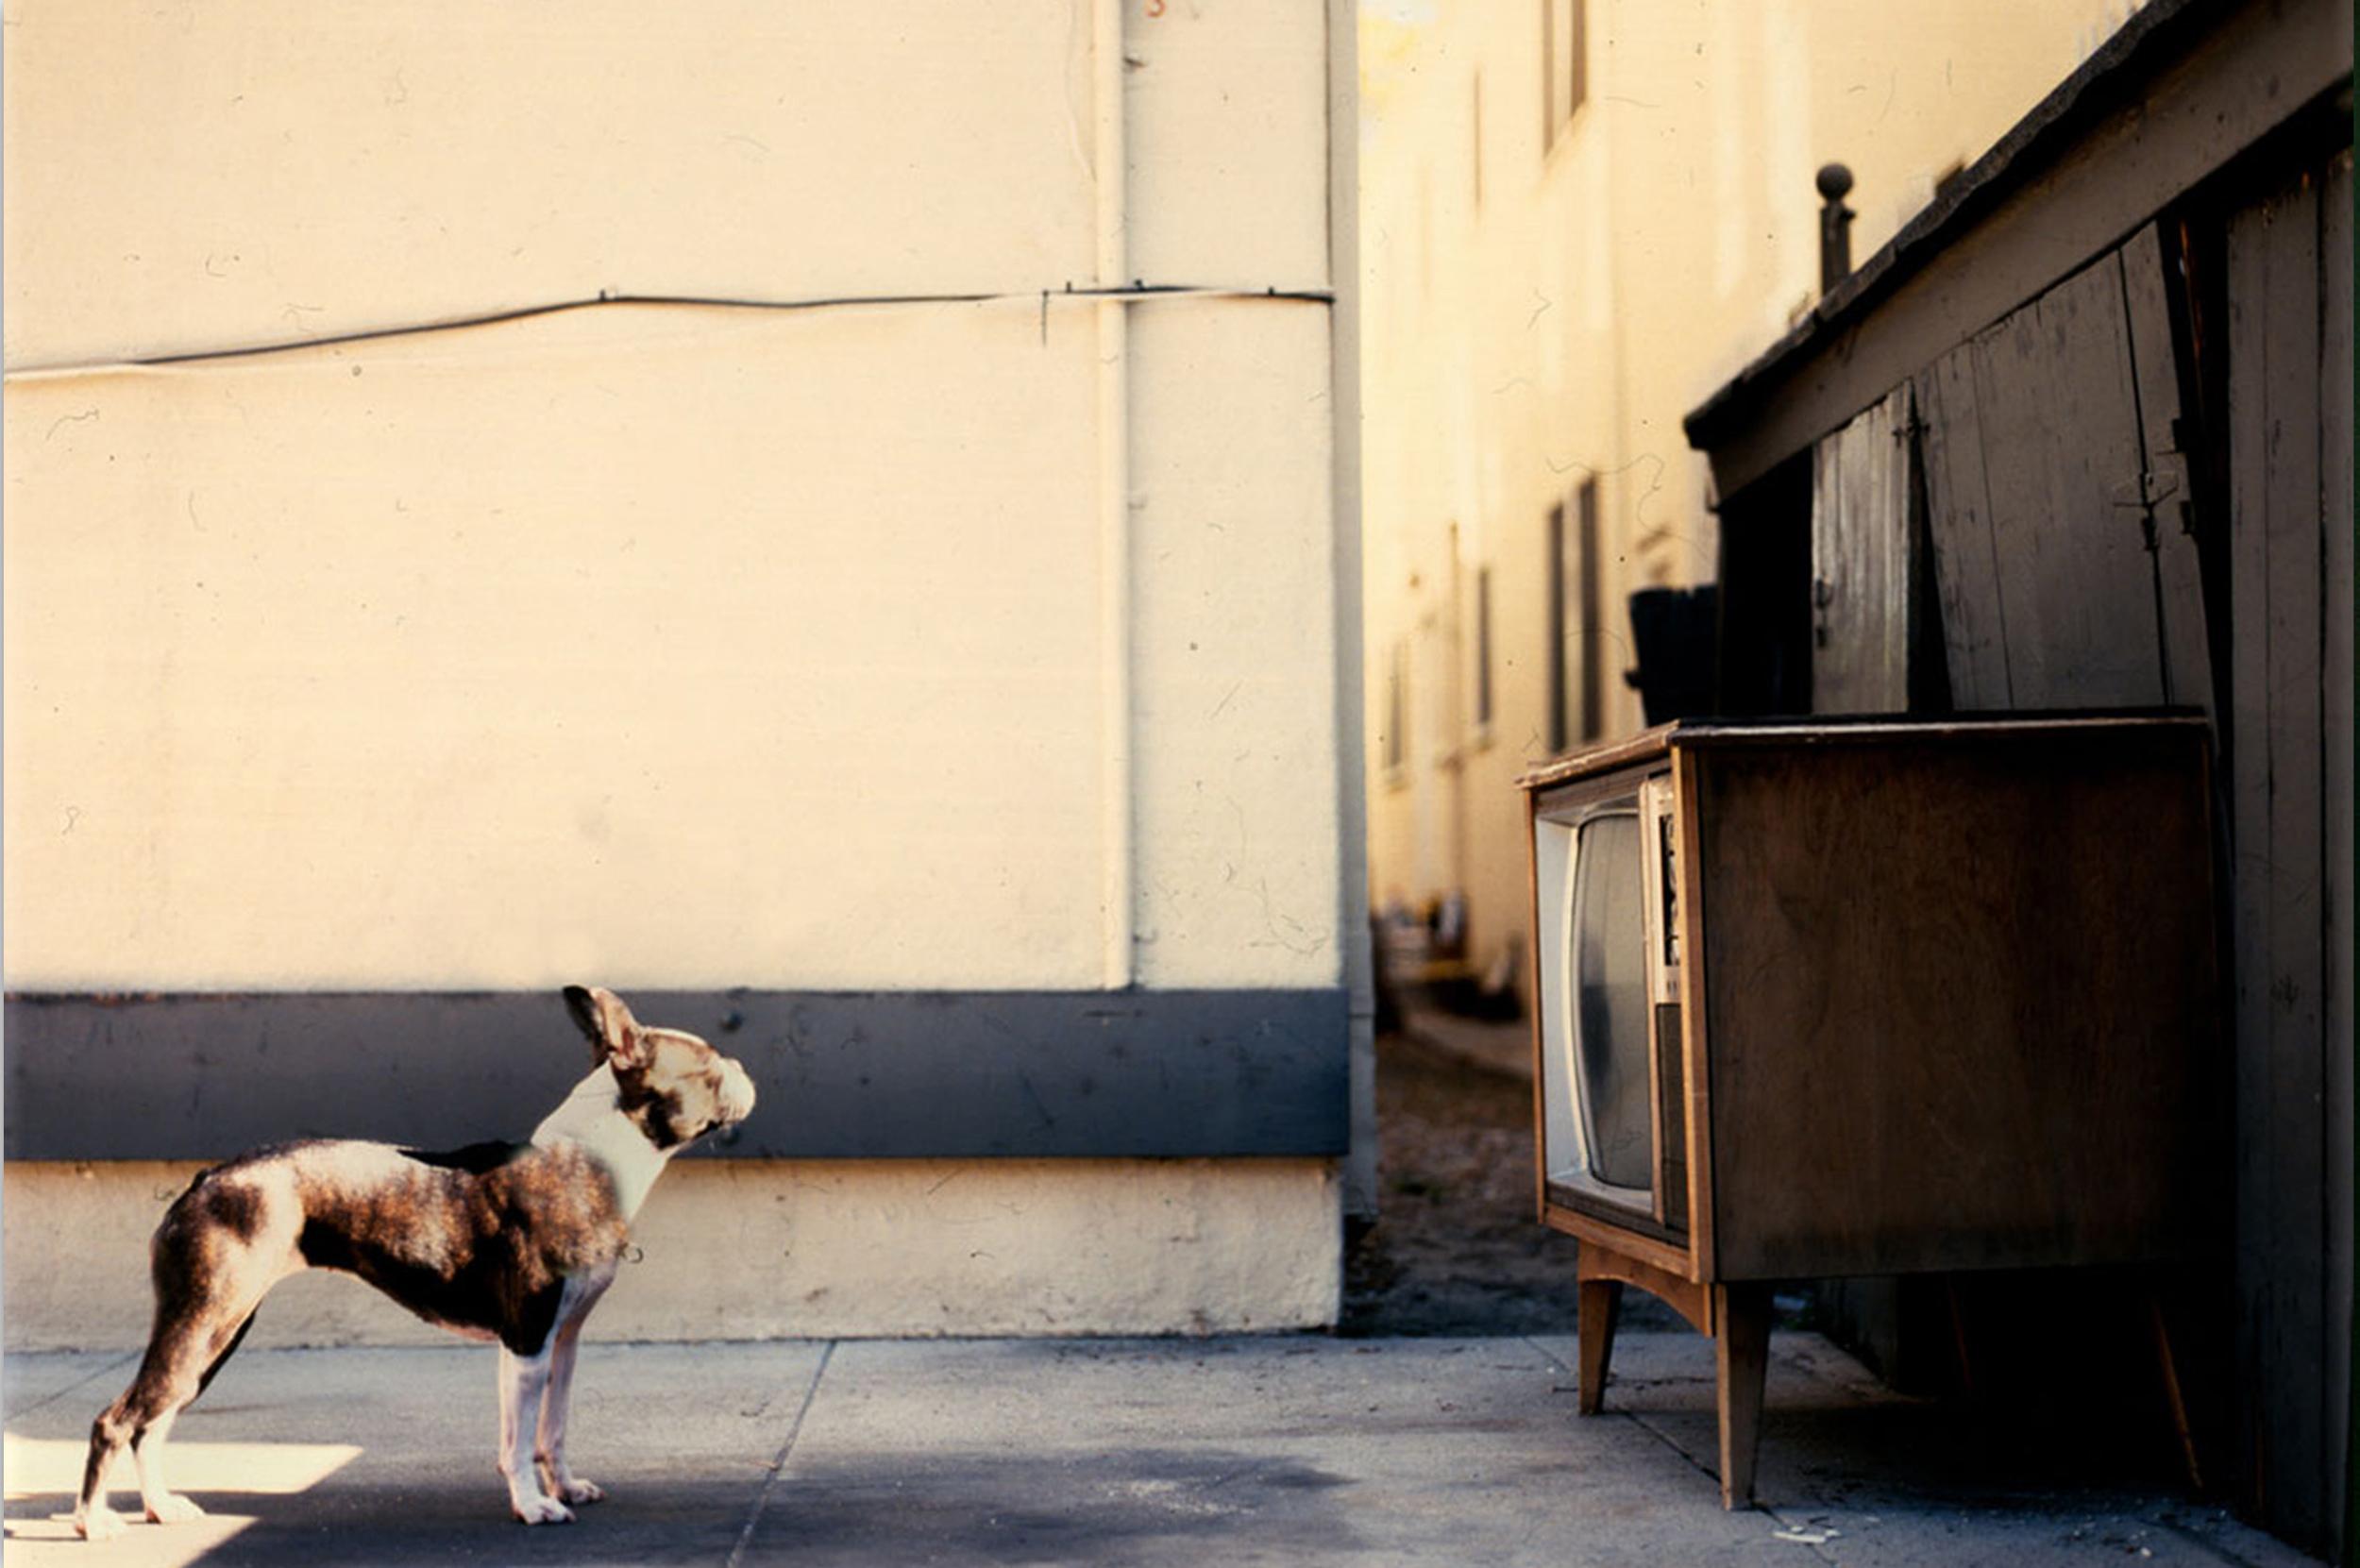 WebsiteMockup_Dogpic.jpg